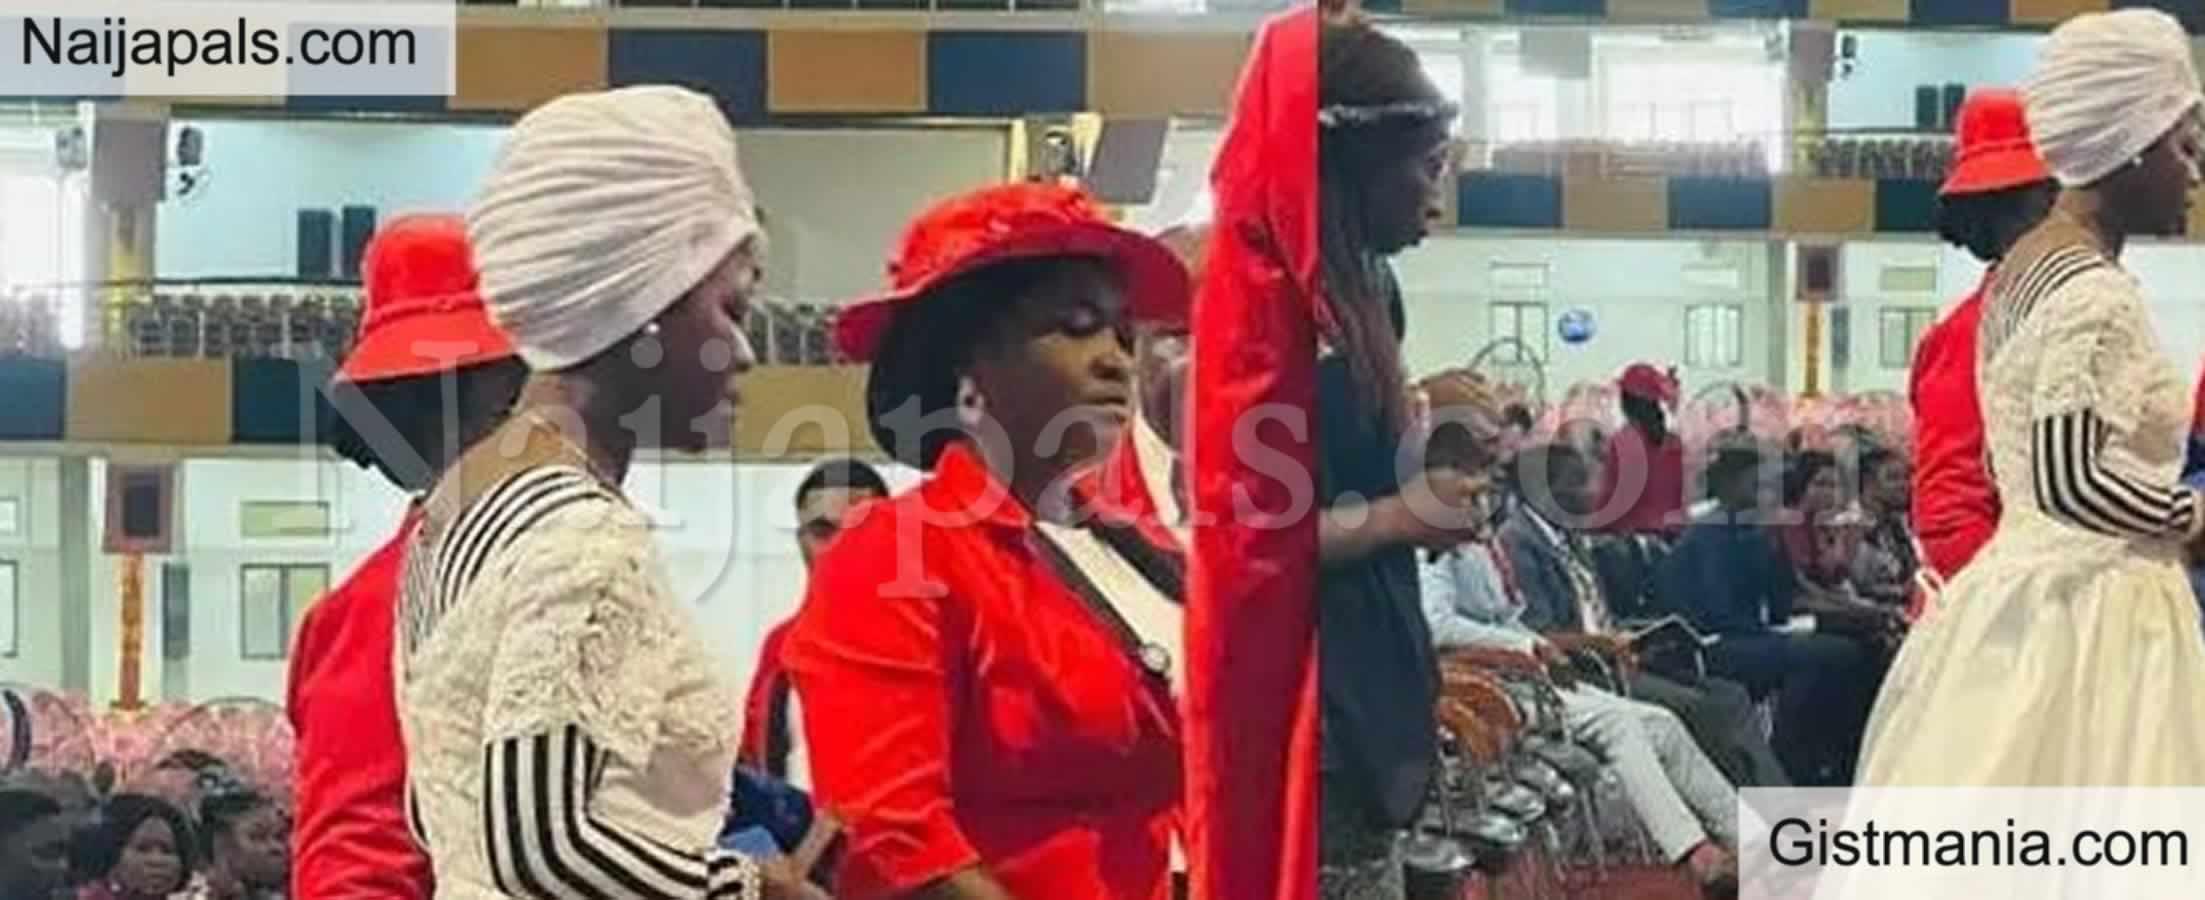 <img alt='.' class='lazyload' data-src='https://img.gistmania.com/emot/photo.png' /> <b>Woman Looking For Husband Wears Wedding Dress To Church </b>(PHOTO)